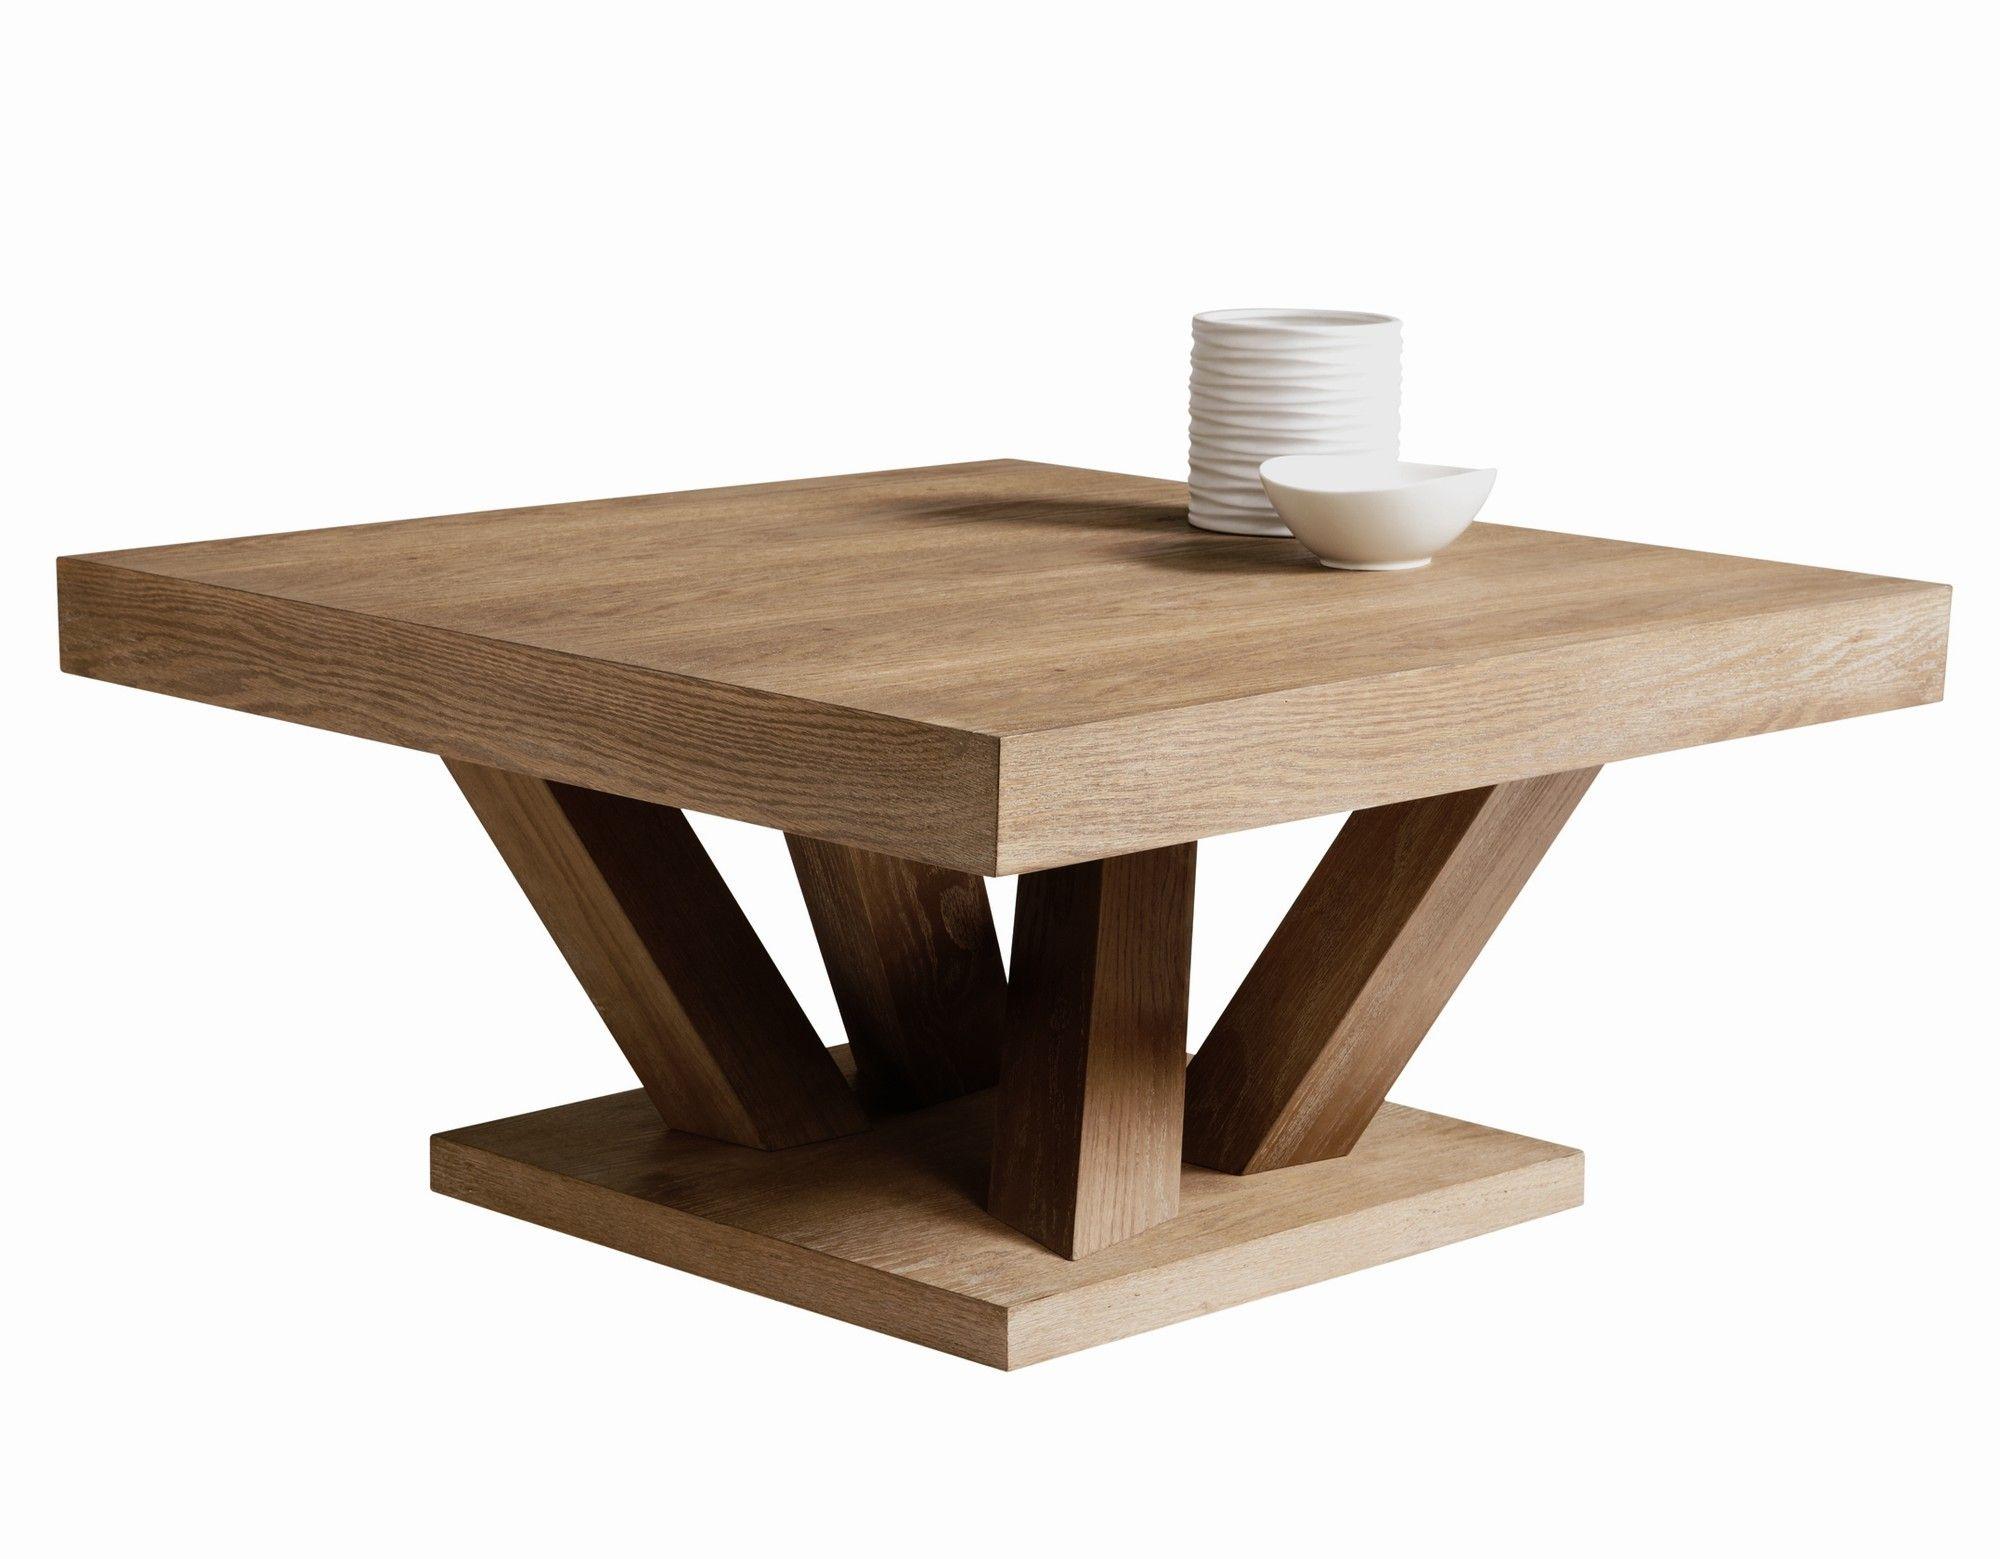 Sunpan modern madero coffee table coffee tables pinterest sunpan modern madero coffee table geotapseo Gallery